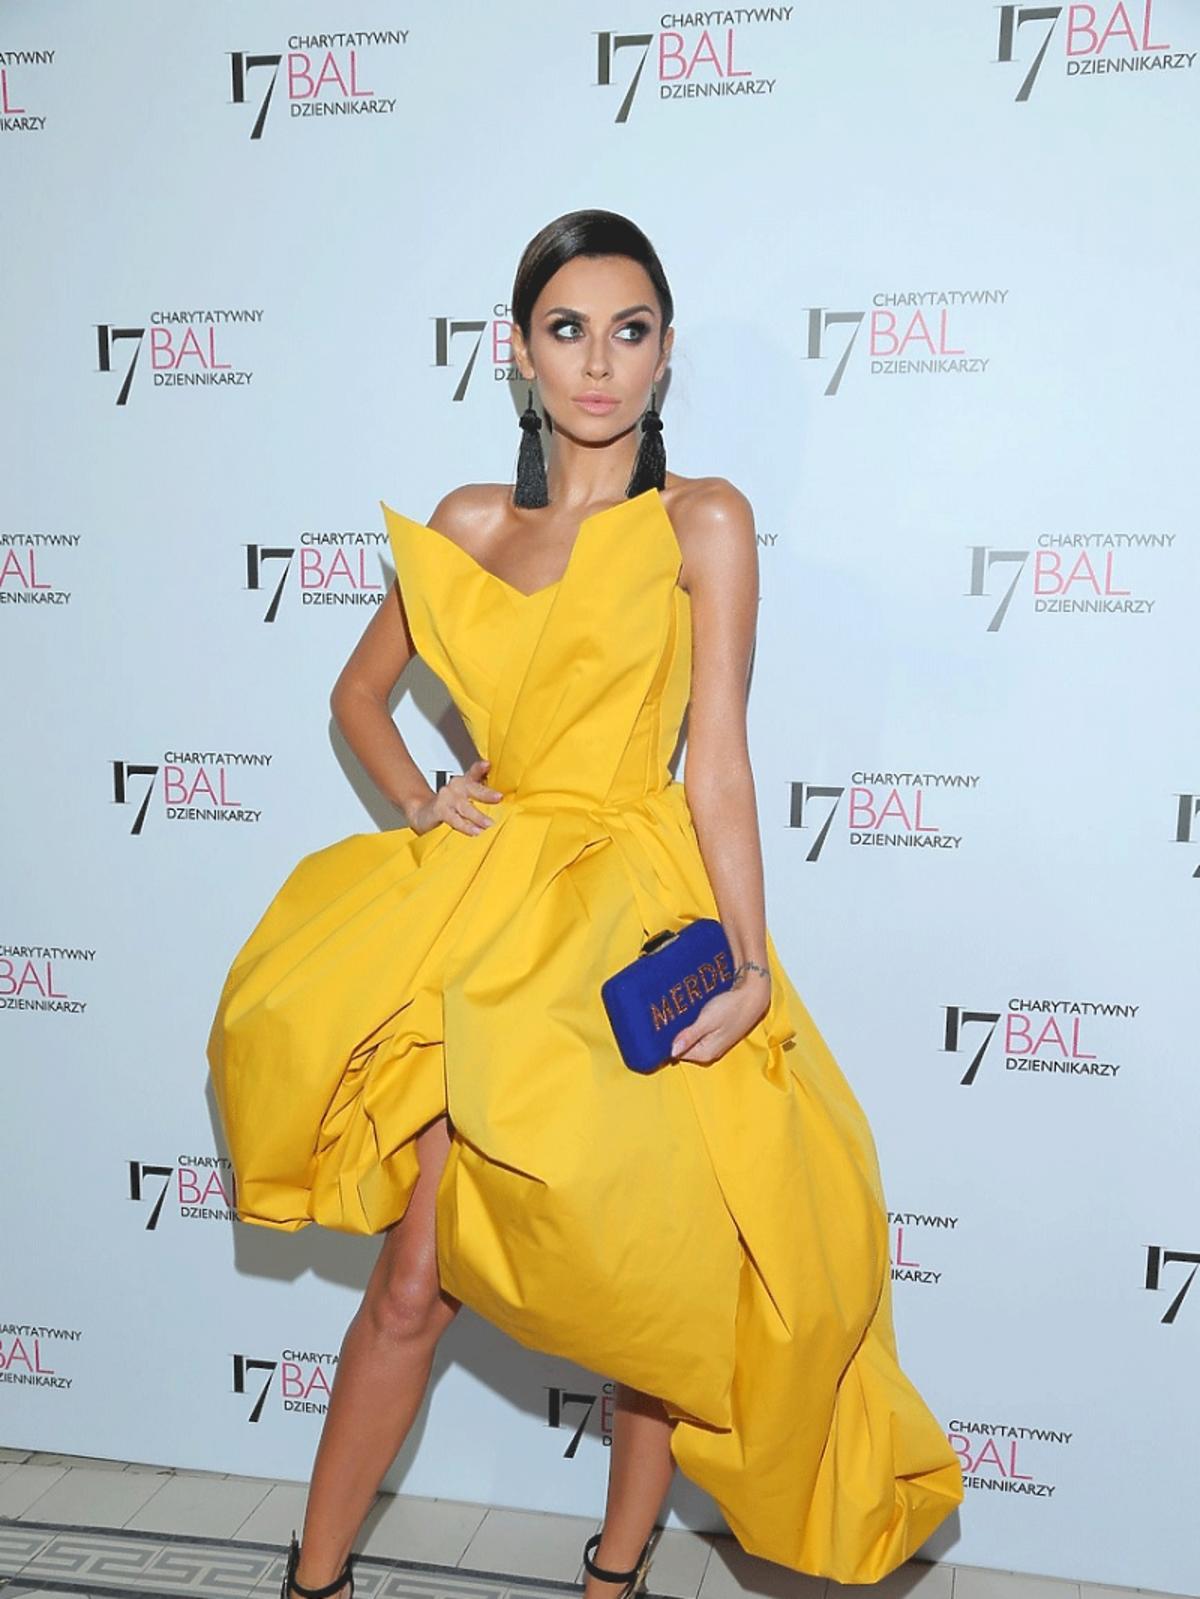 Natalia Siwiec w żółtej sukience Bartka Janusza